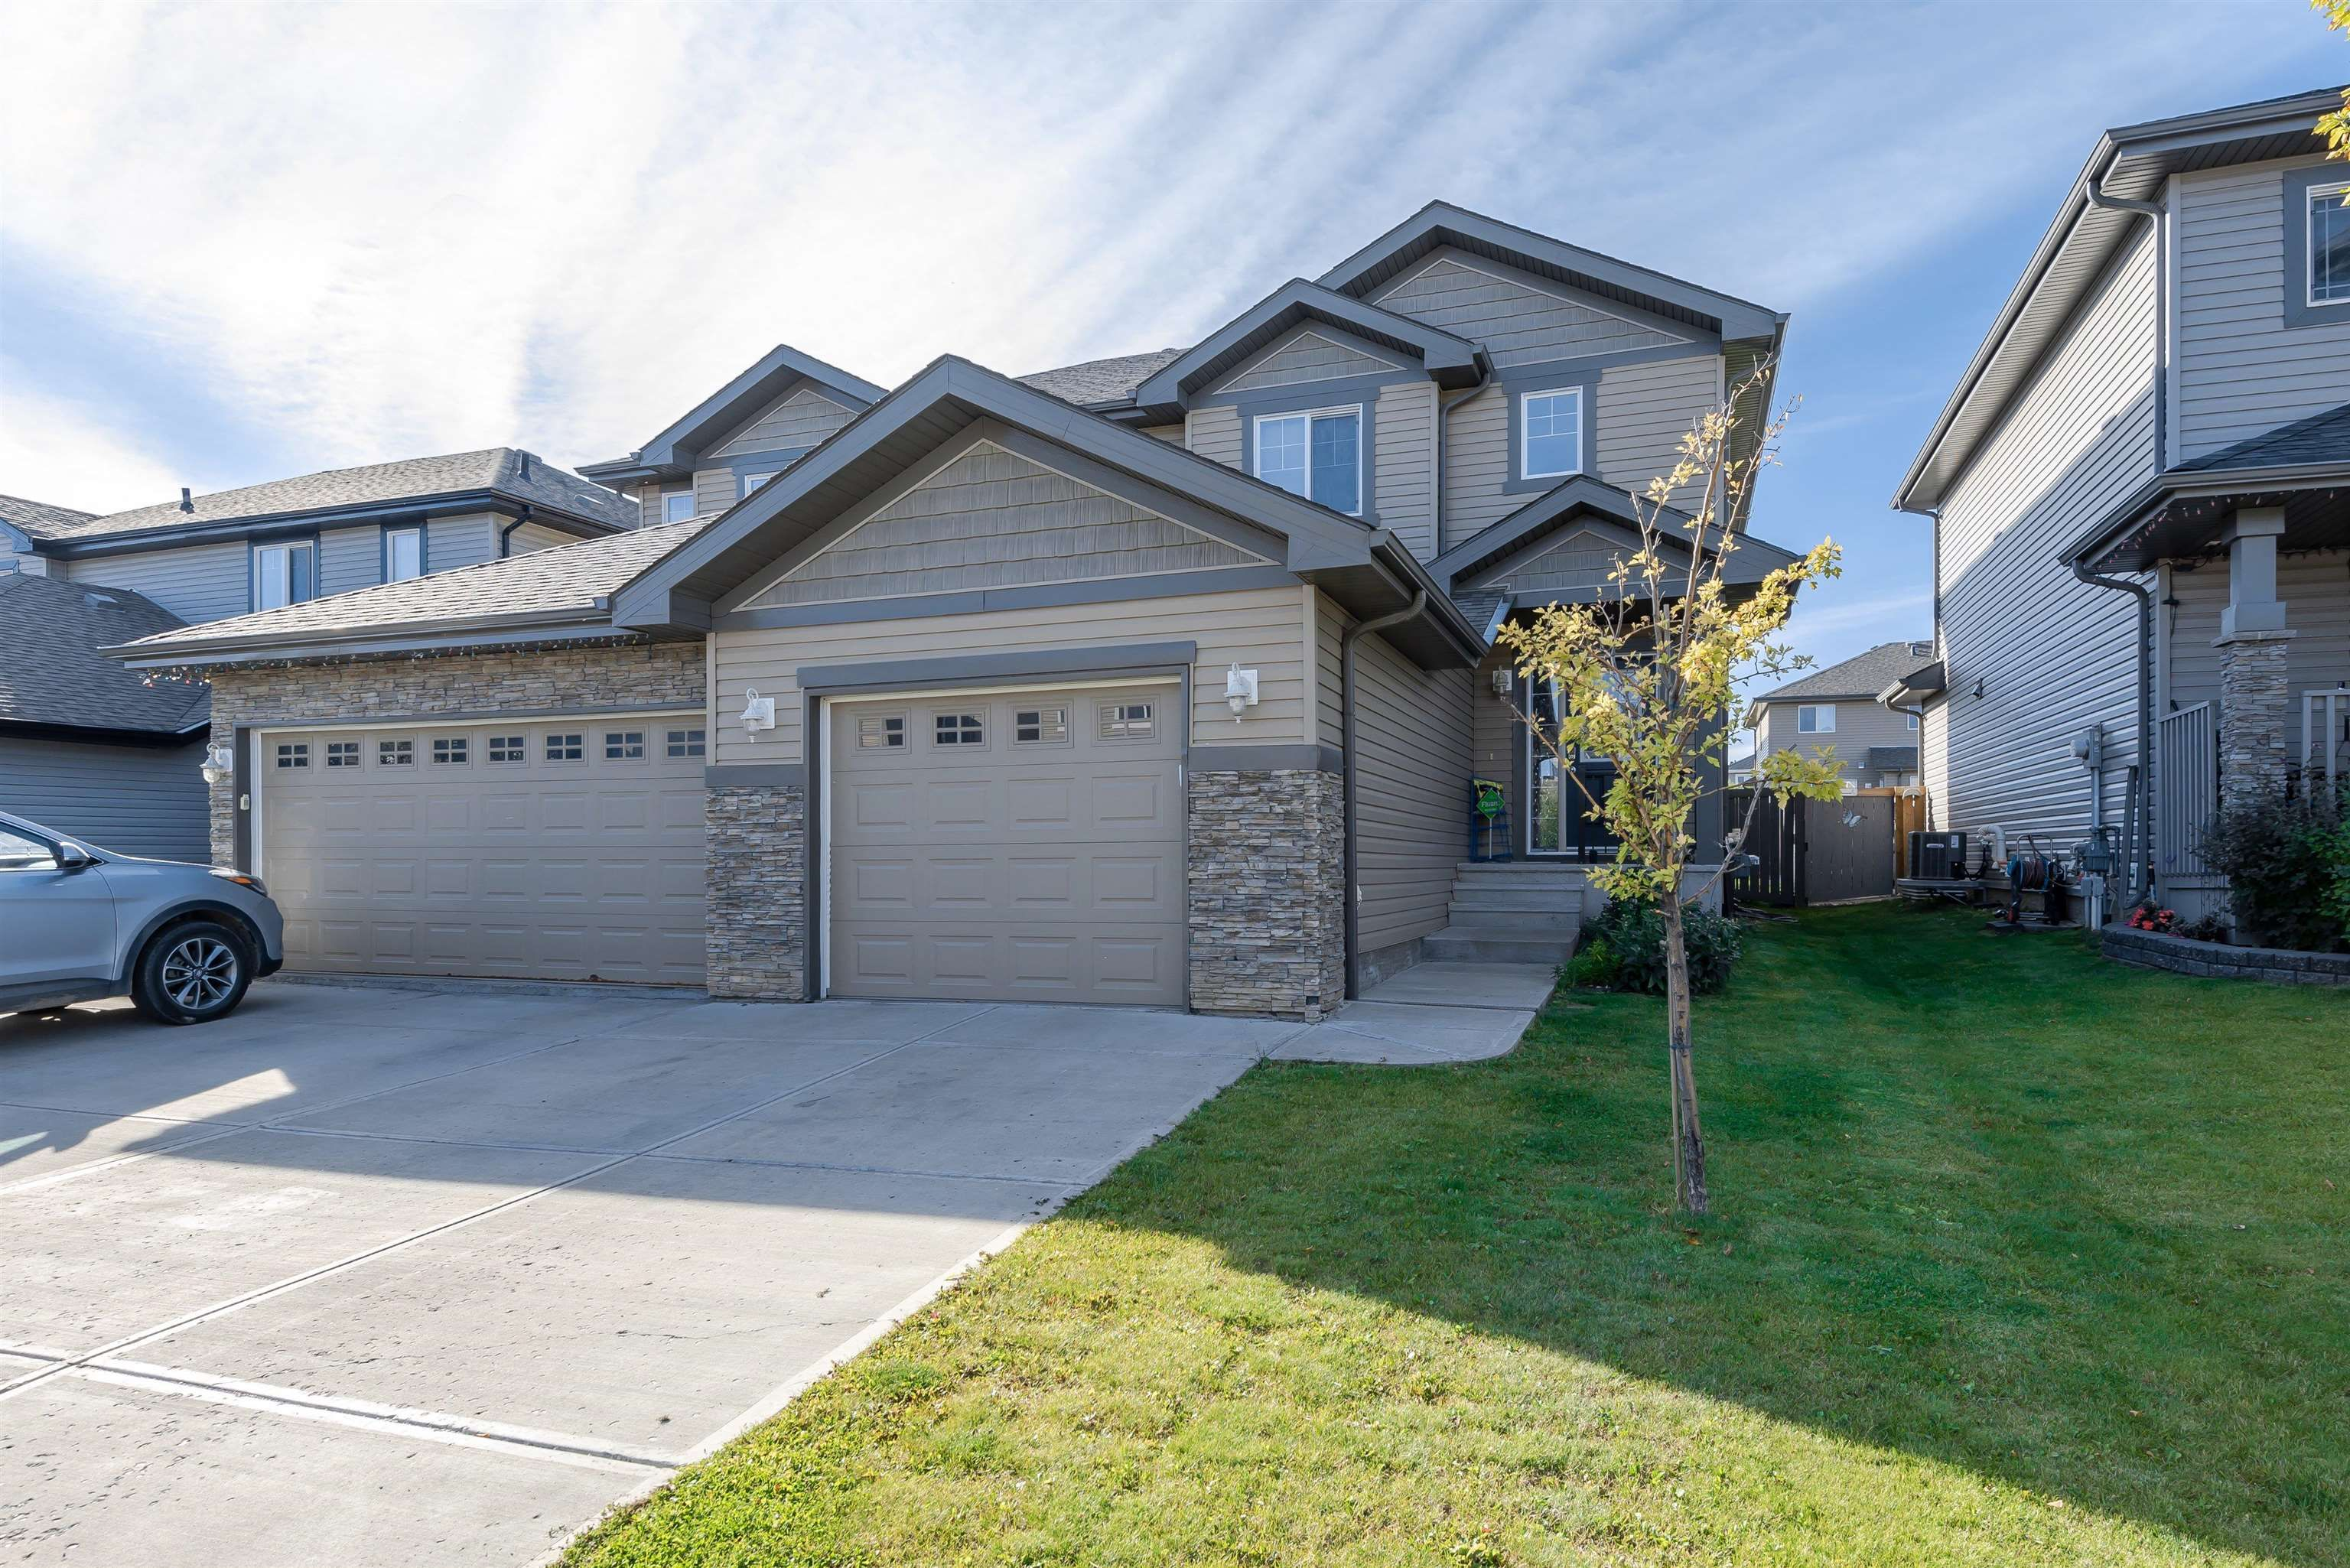 Main Photo: 2333 CASSELMAN Crescent in Edmonton: Zone 55 House Half Duplex for sale : MLS®# E4262948